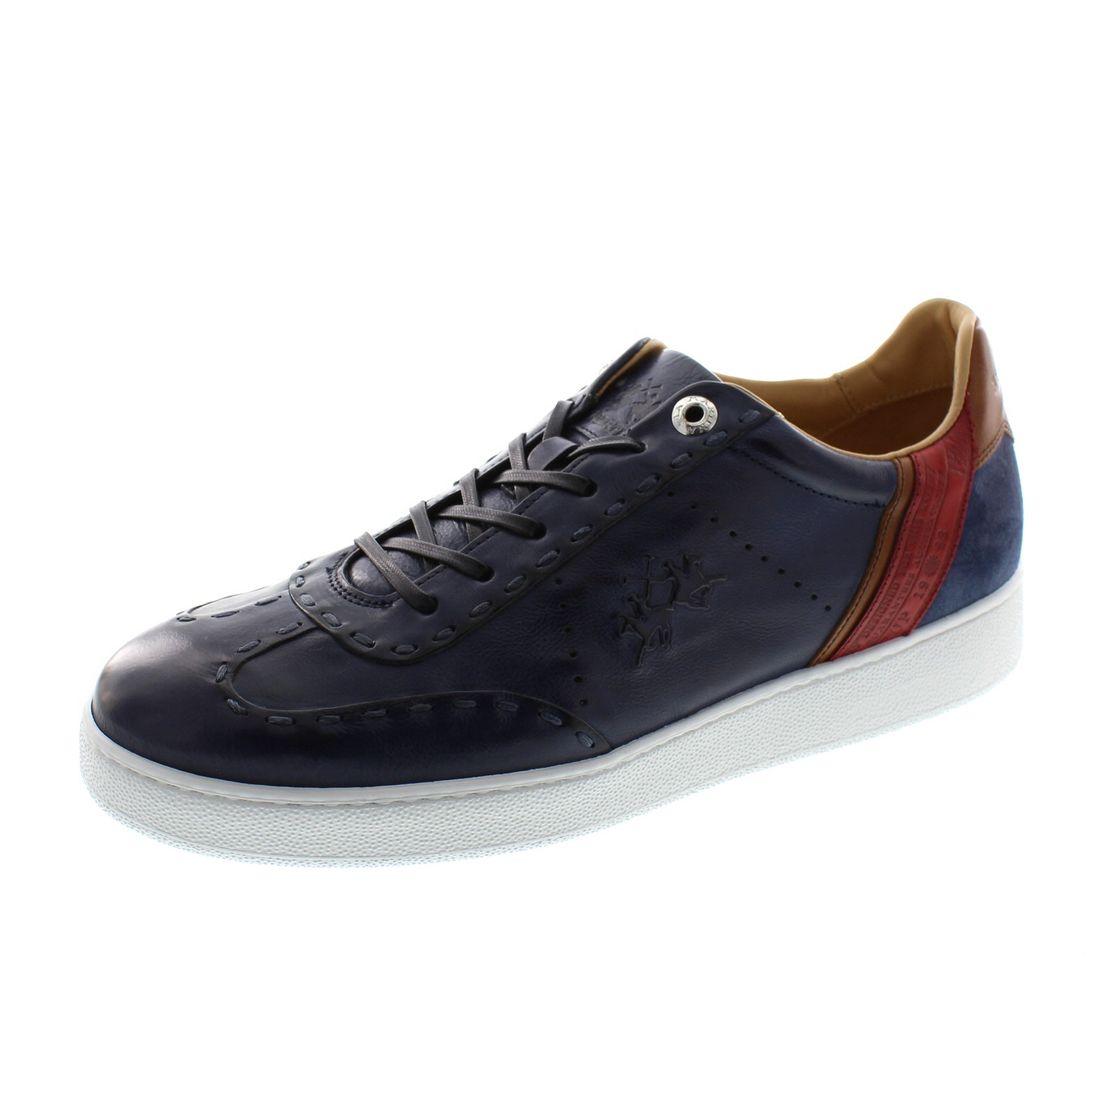 LA MARTINA Schuhe - Sneaker LFM201031 - jeans